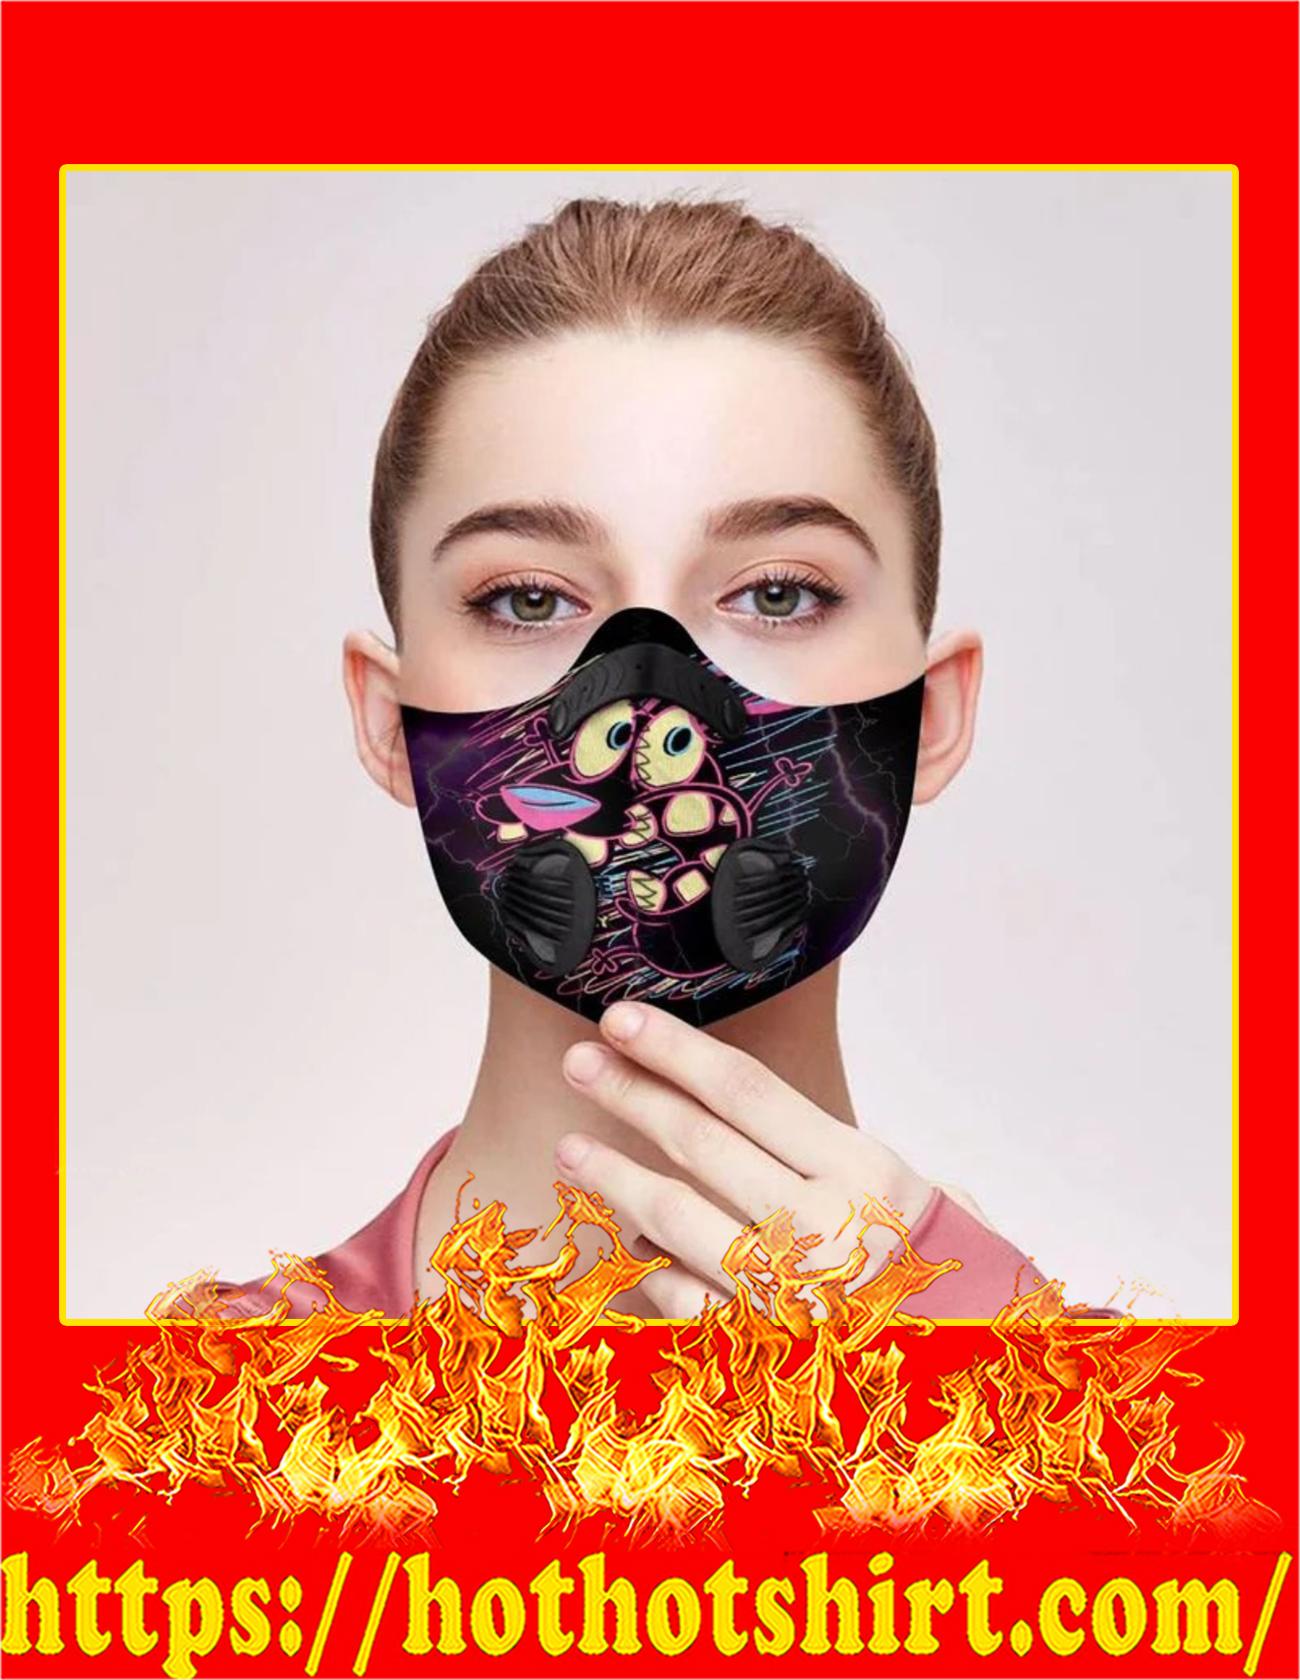 Cowardly dog filter face mask - Pic 2